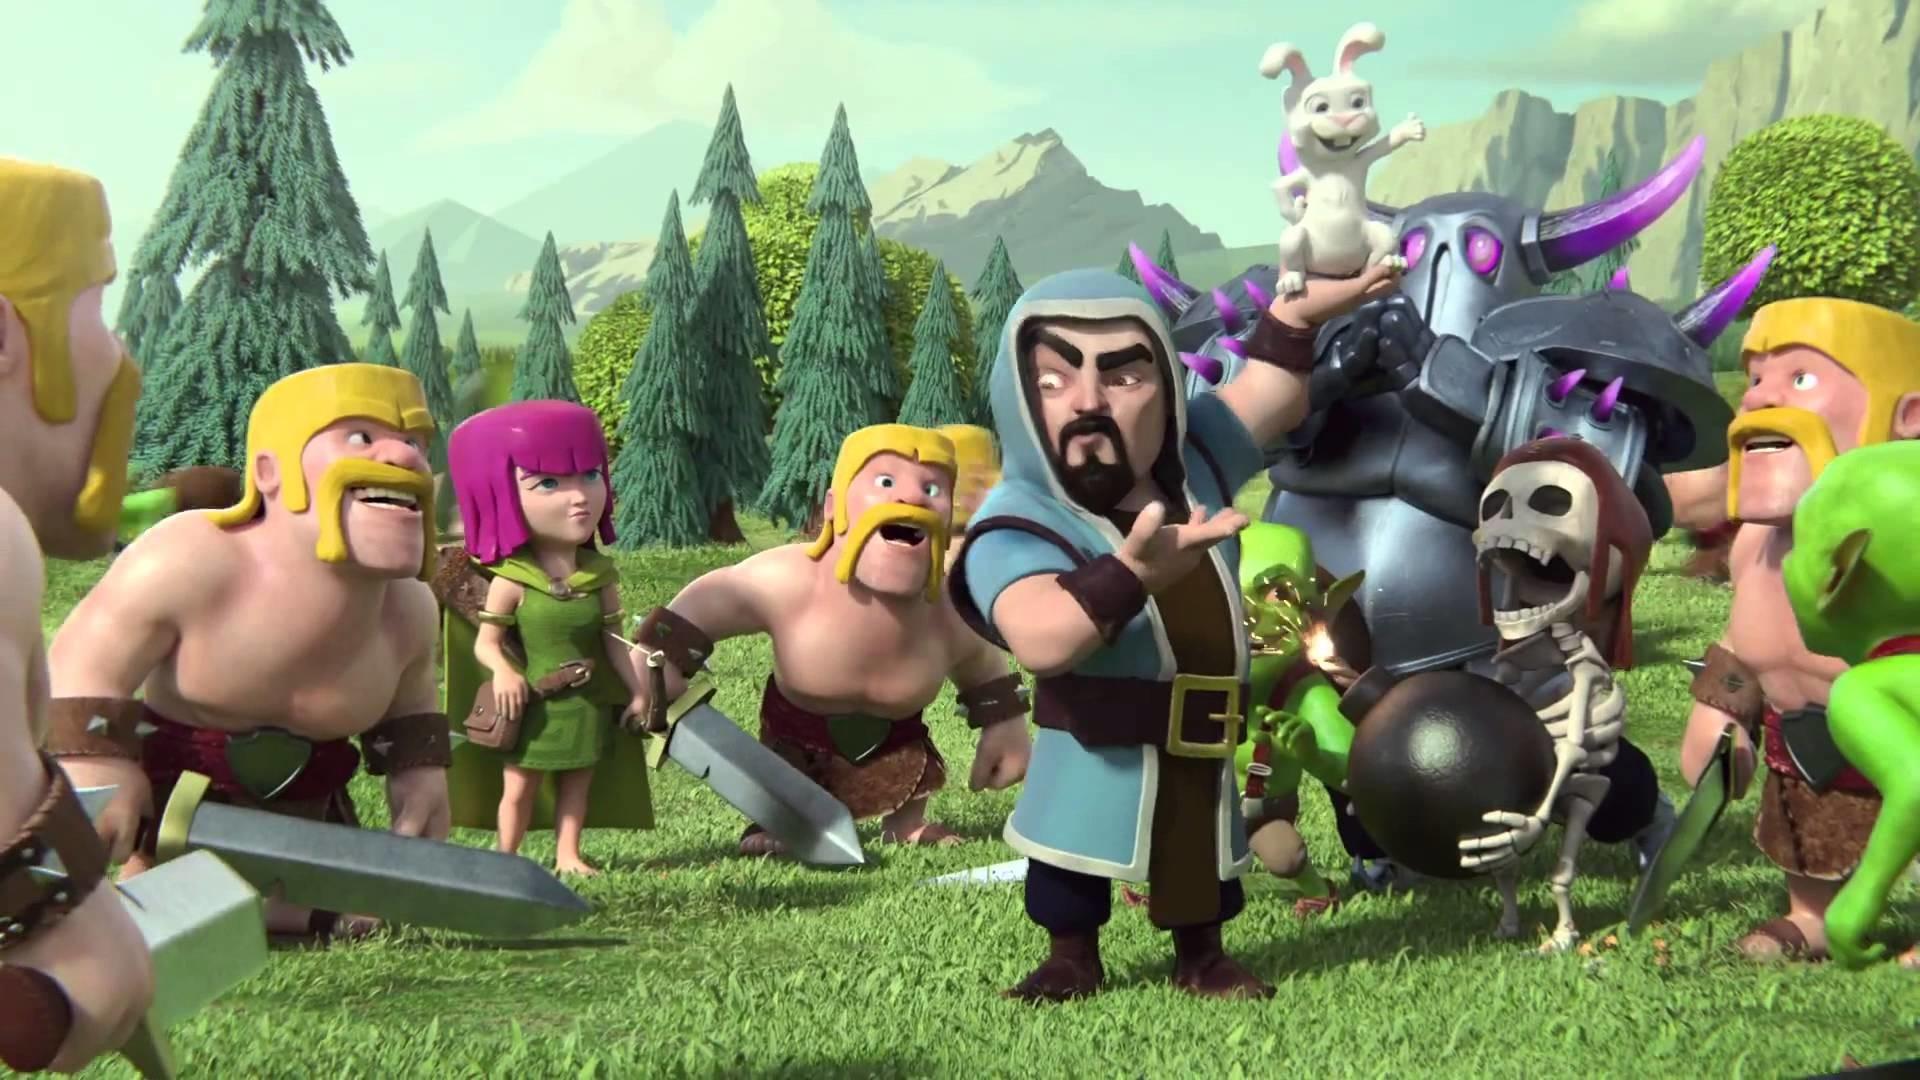 Barbarian Clash Of Clans Hd Hd Games 4k Wallpapers: Clash Of Clans Barbarian Wallpaper (73+ Images